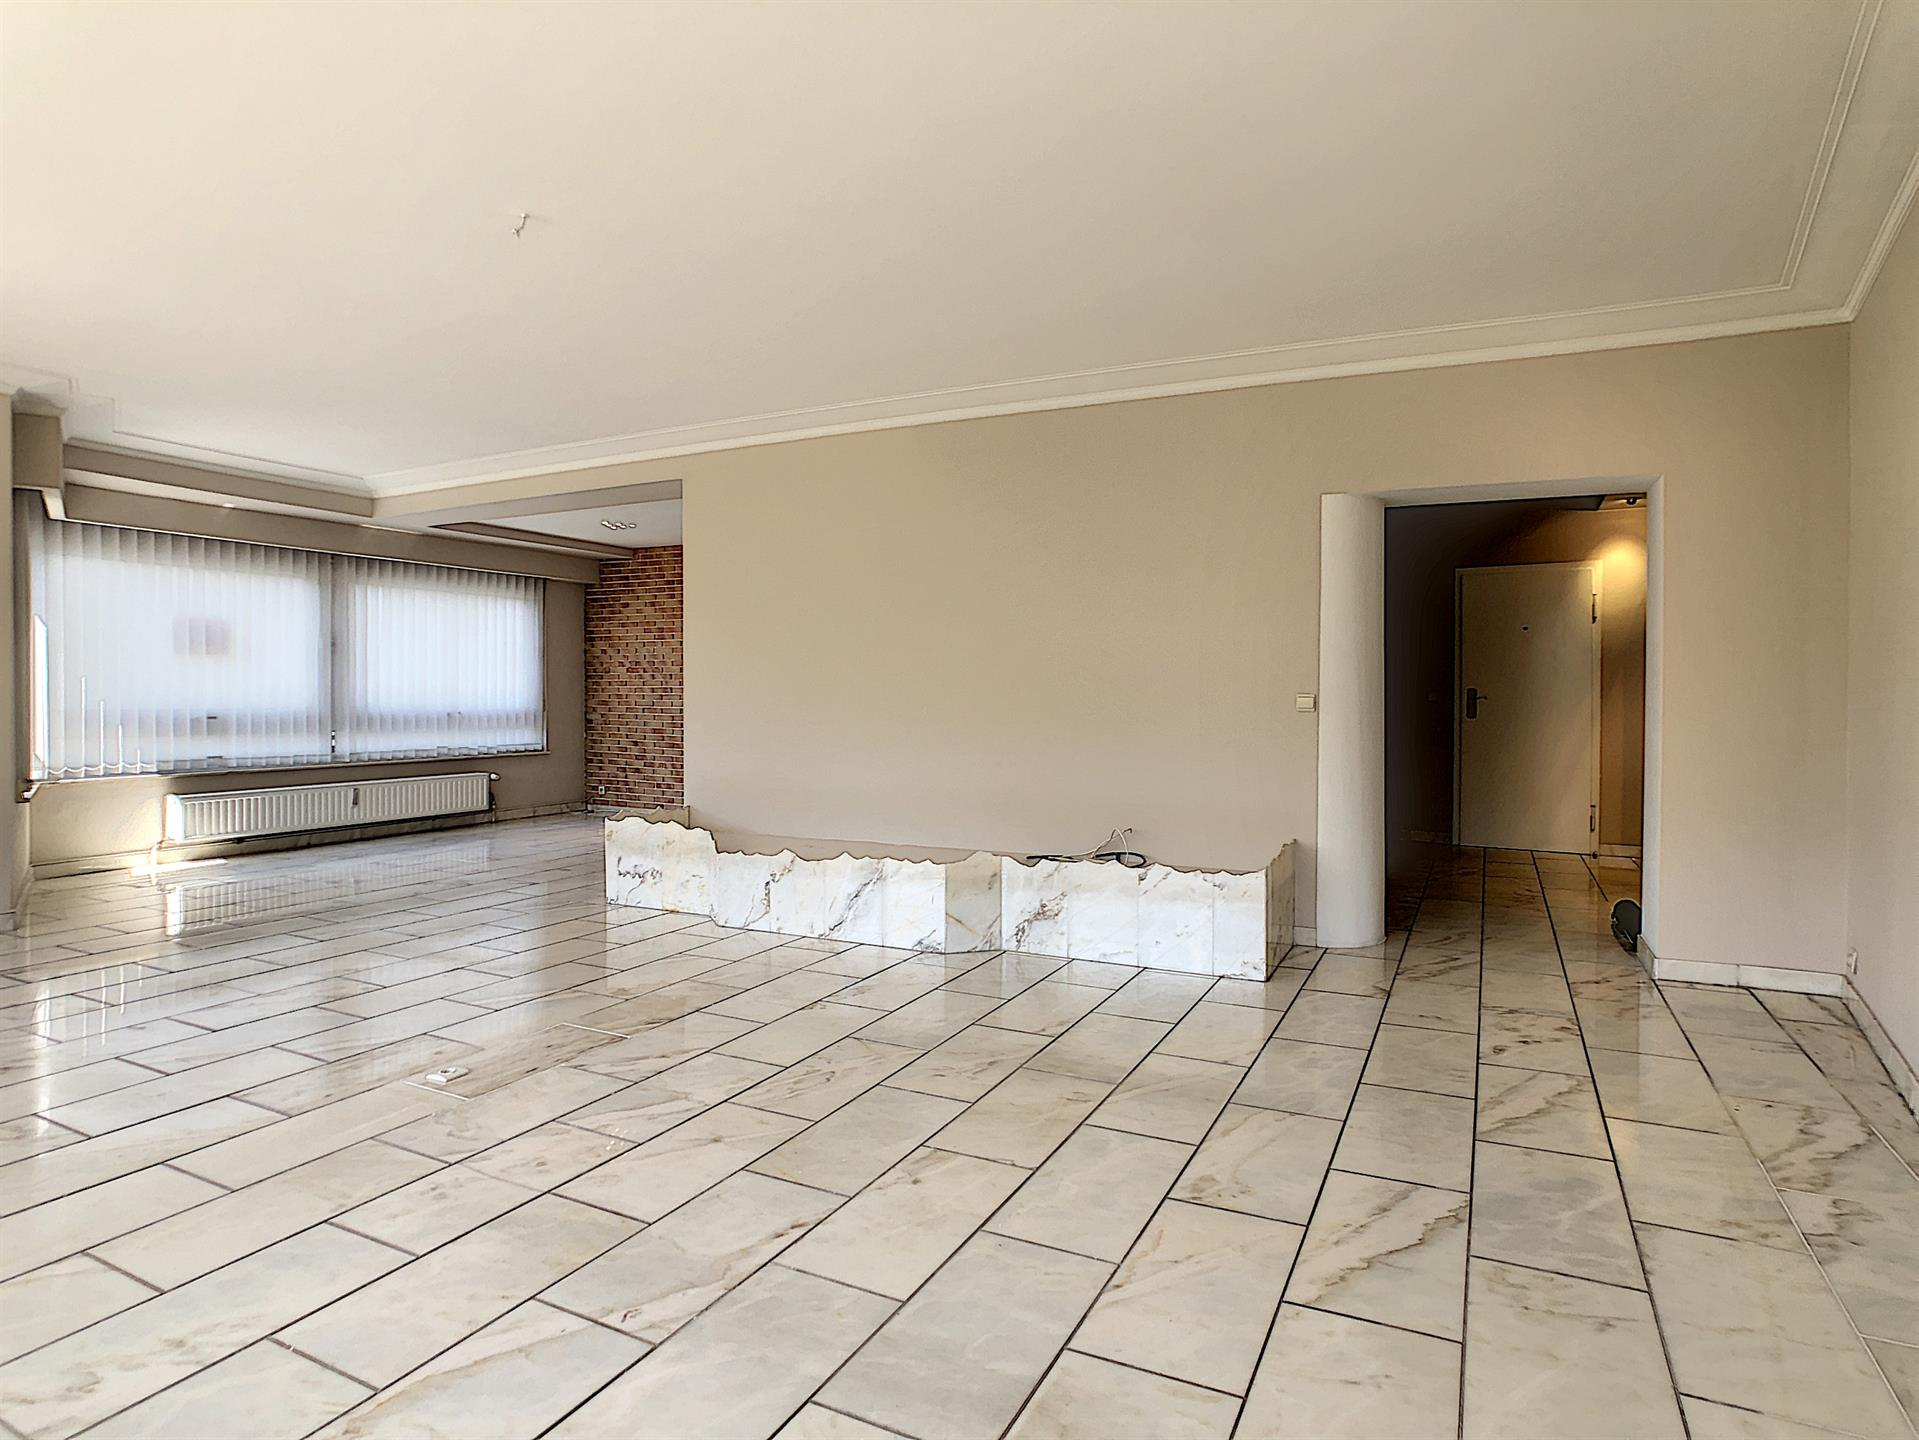 Appartement - Molenbeek-Saint-Jean - #4134416-1